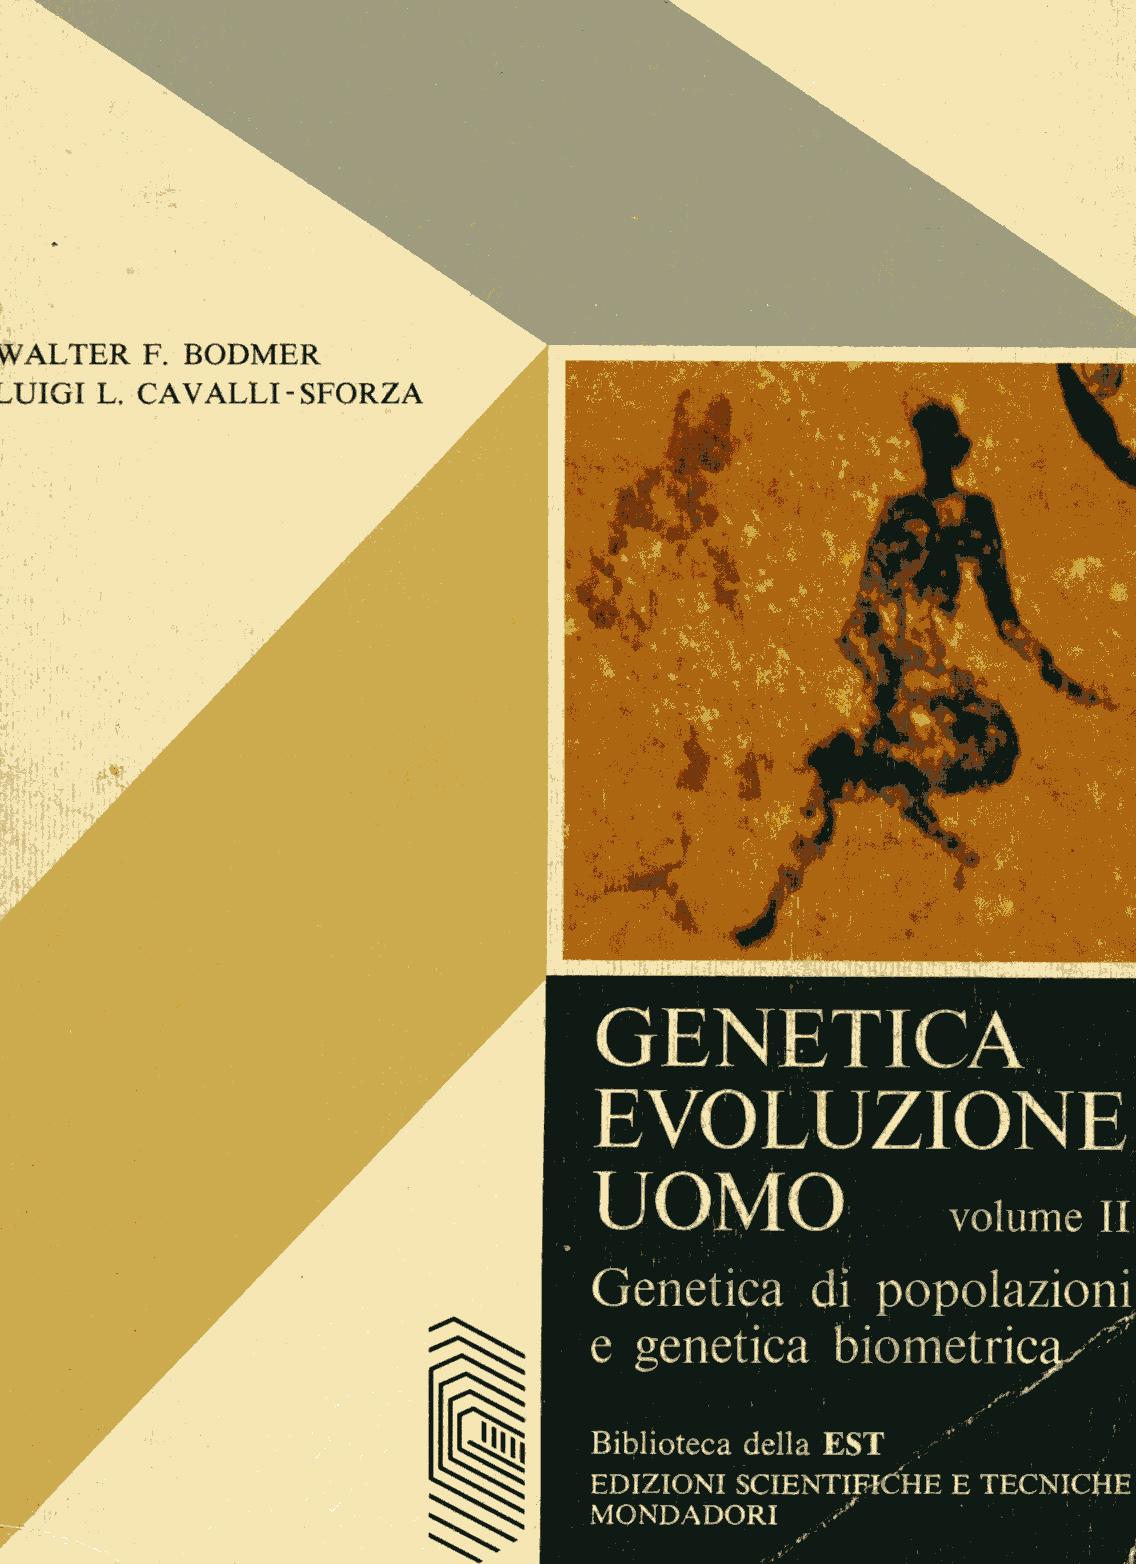 Genetica, evoluzione, uomo Vol.II